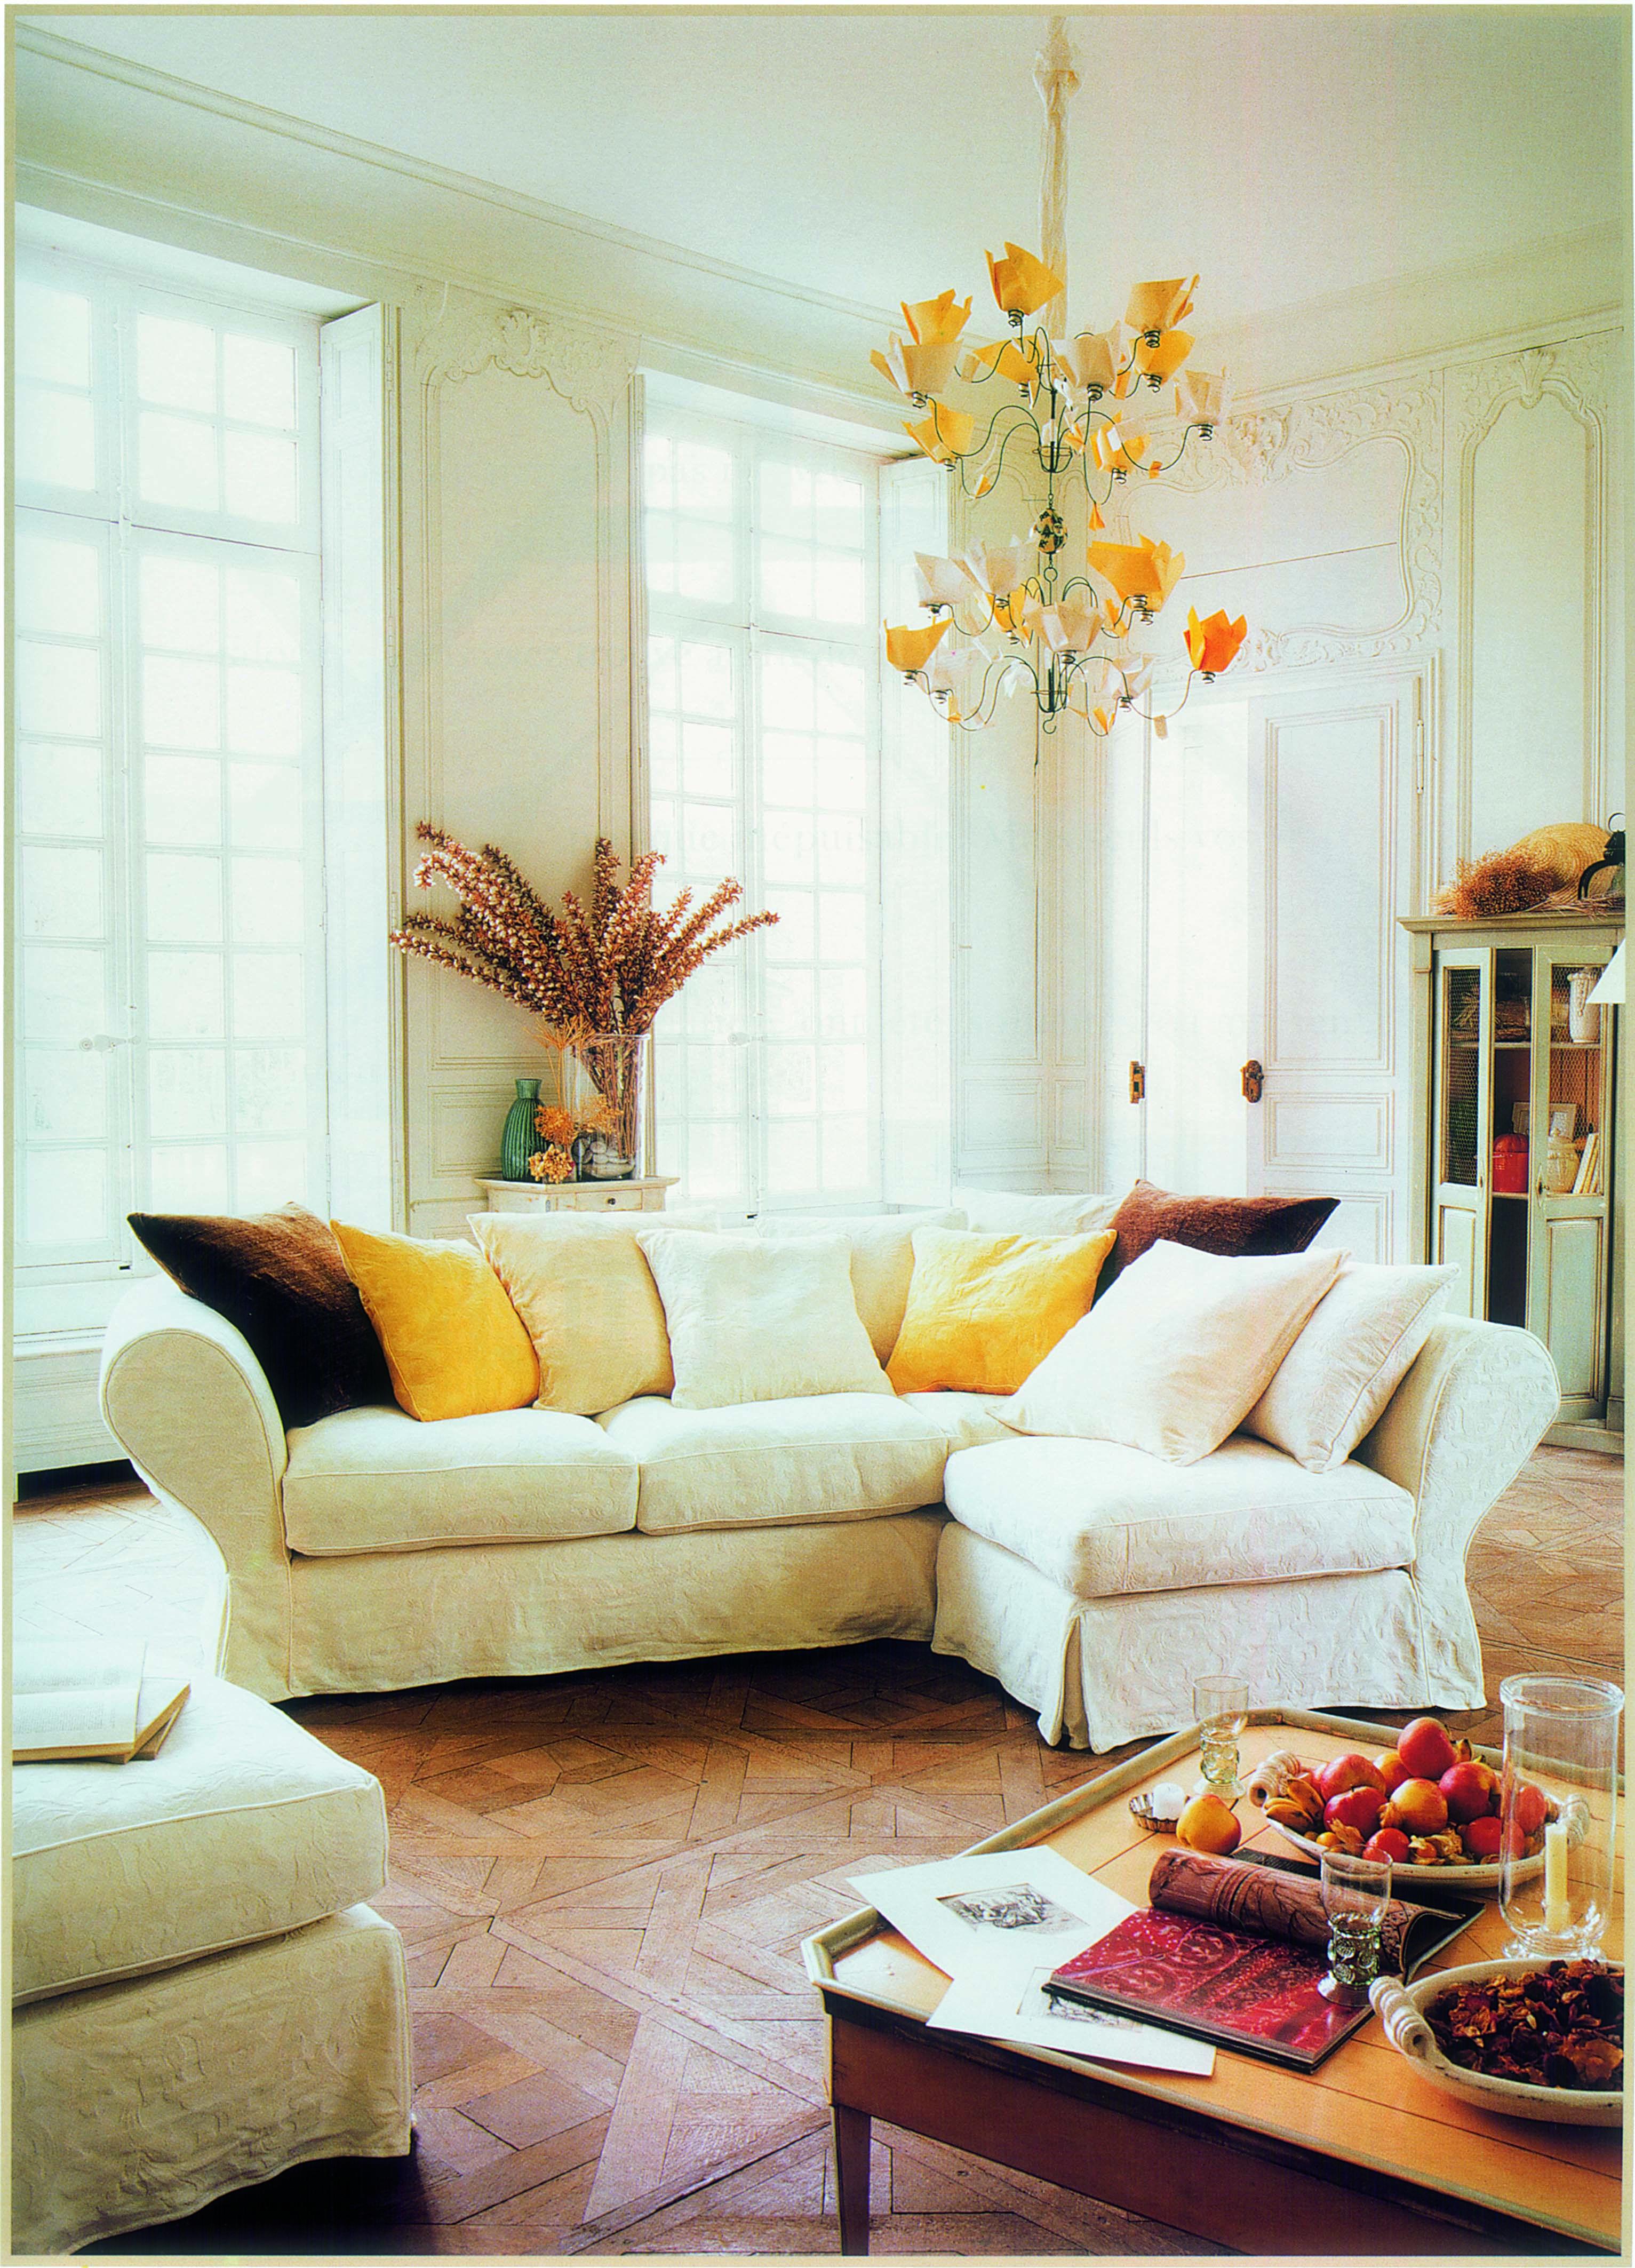 Roche Bobois Les Provinciales Collection Now Known As The Nouveaux Classiques At The Time Of Its Launch In The 1980s Rochebobois Chaisse Salon